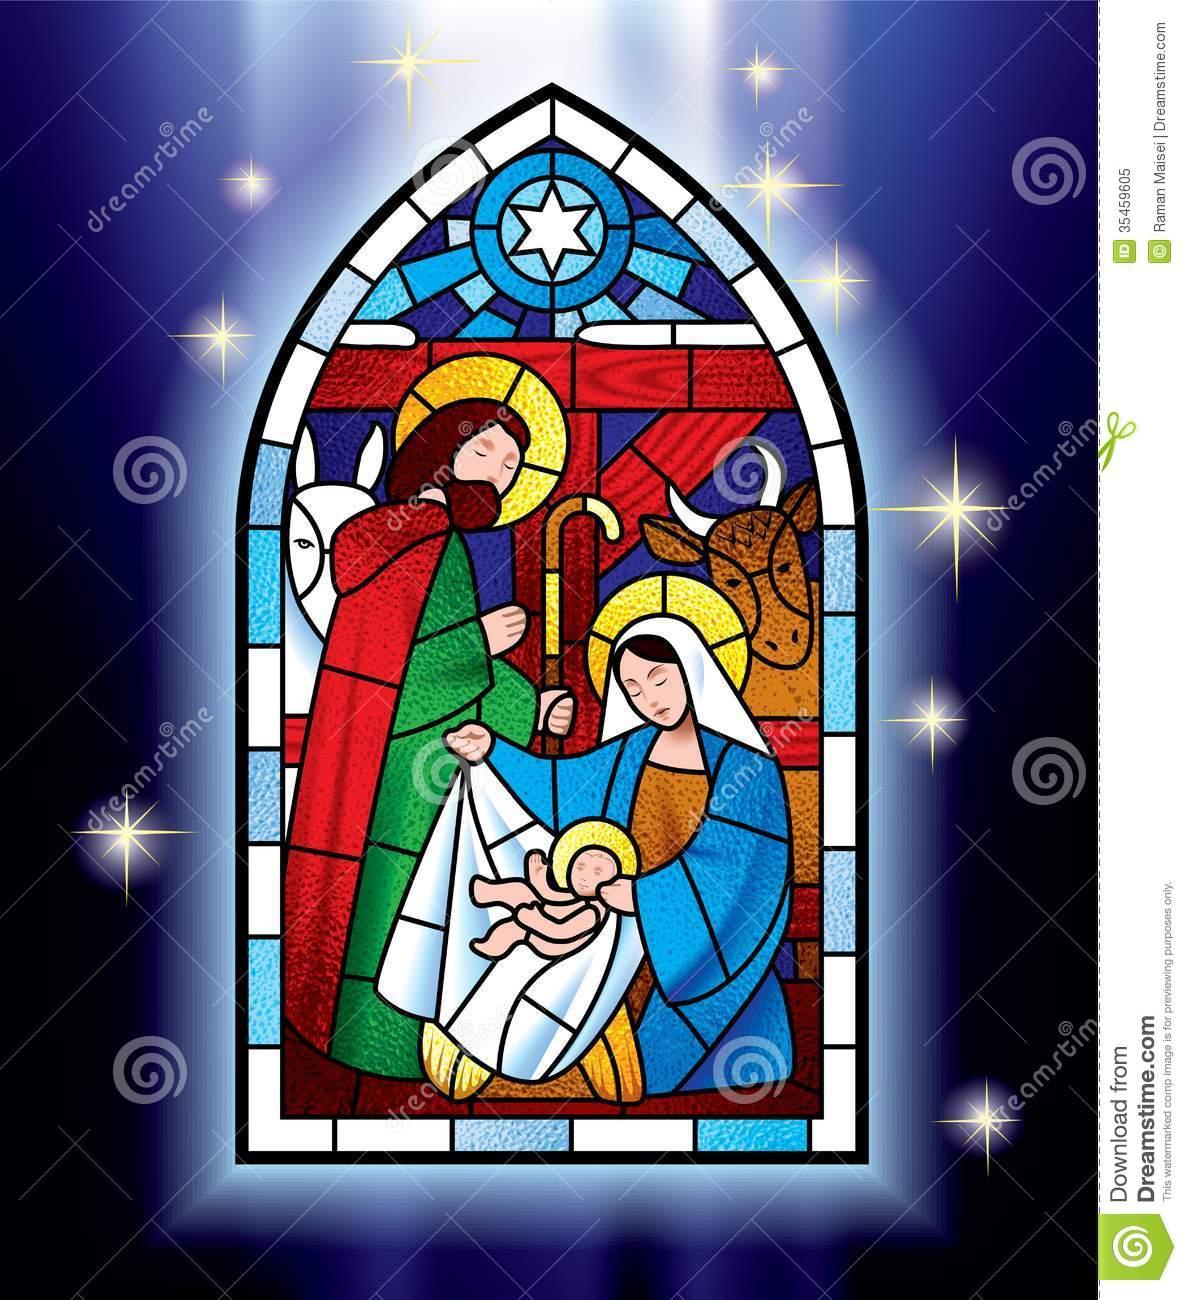 Stained Glass clipart manger scene Clip Christmas  Windows glass